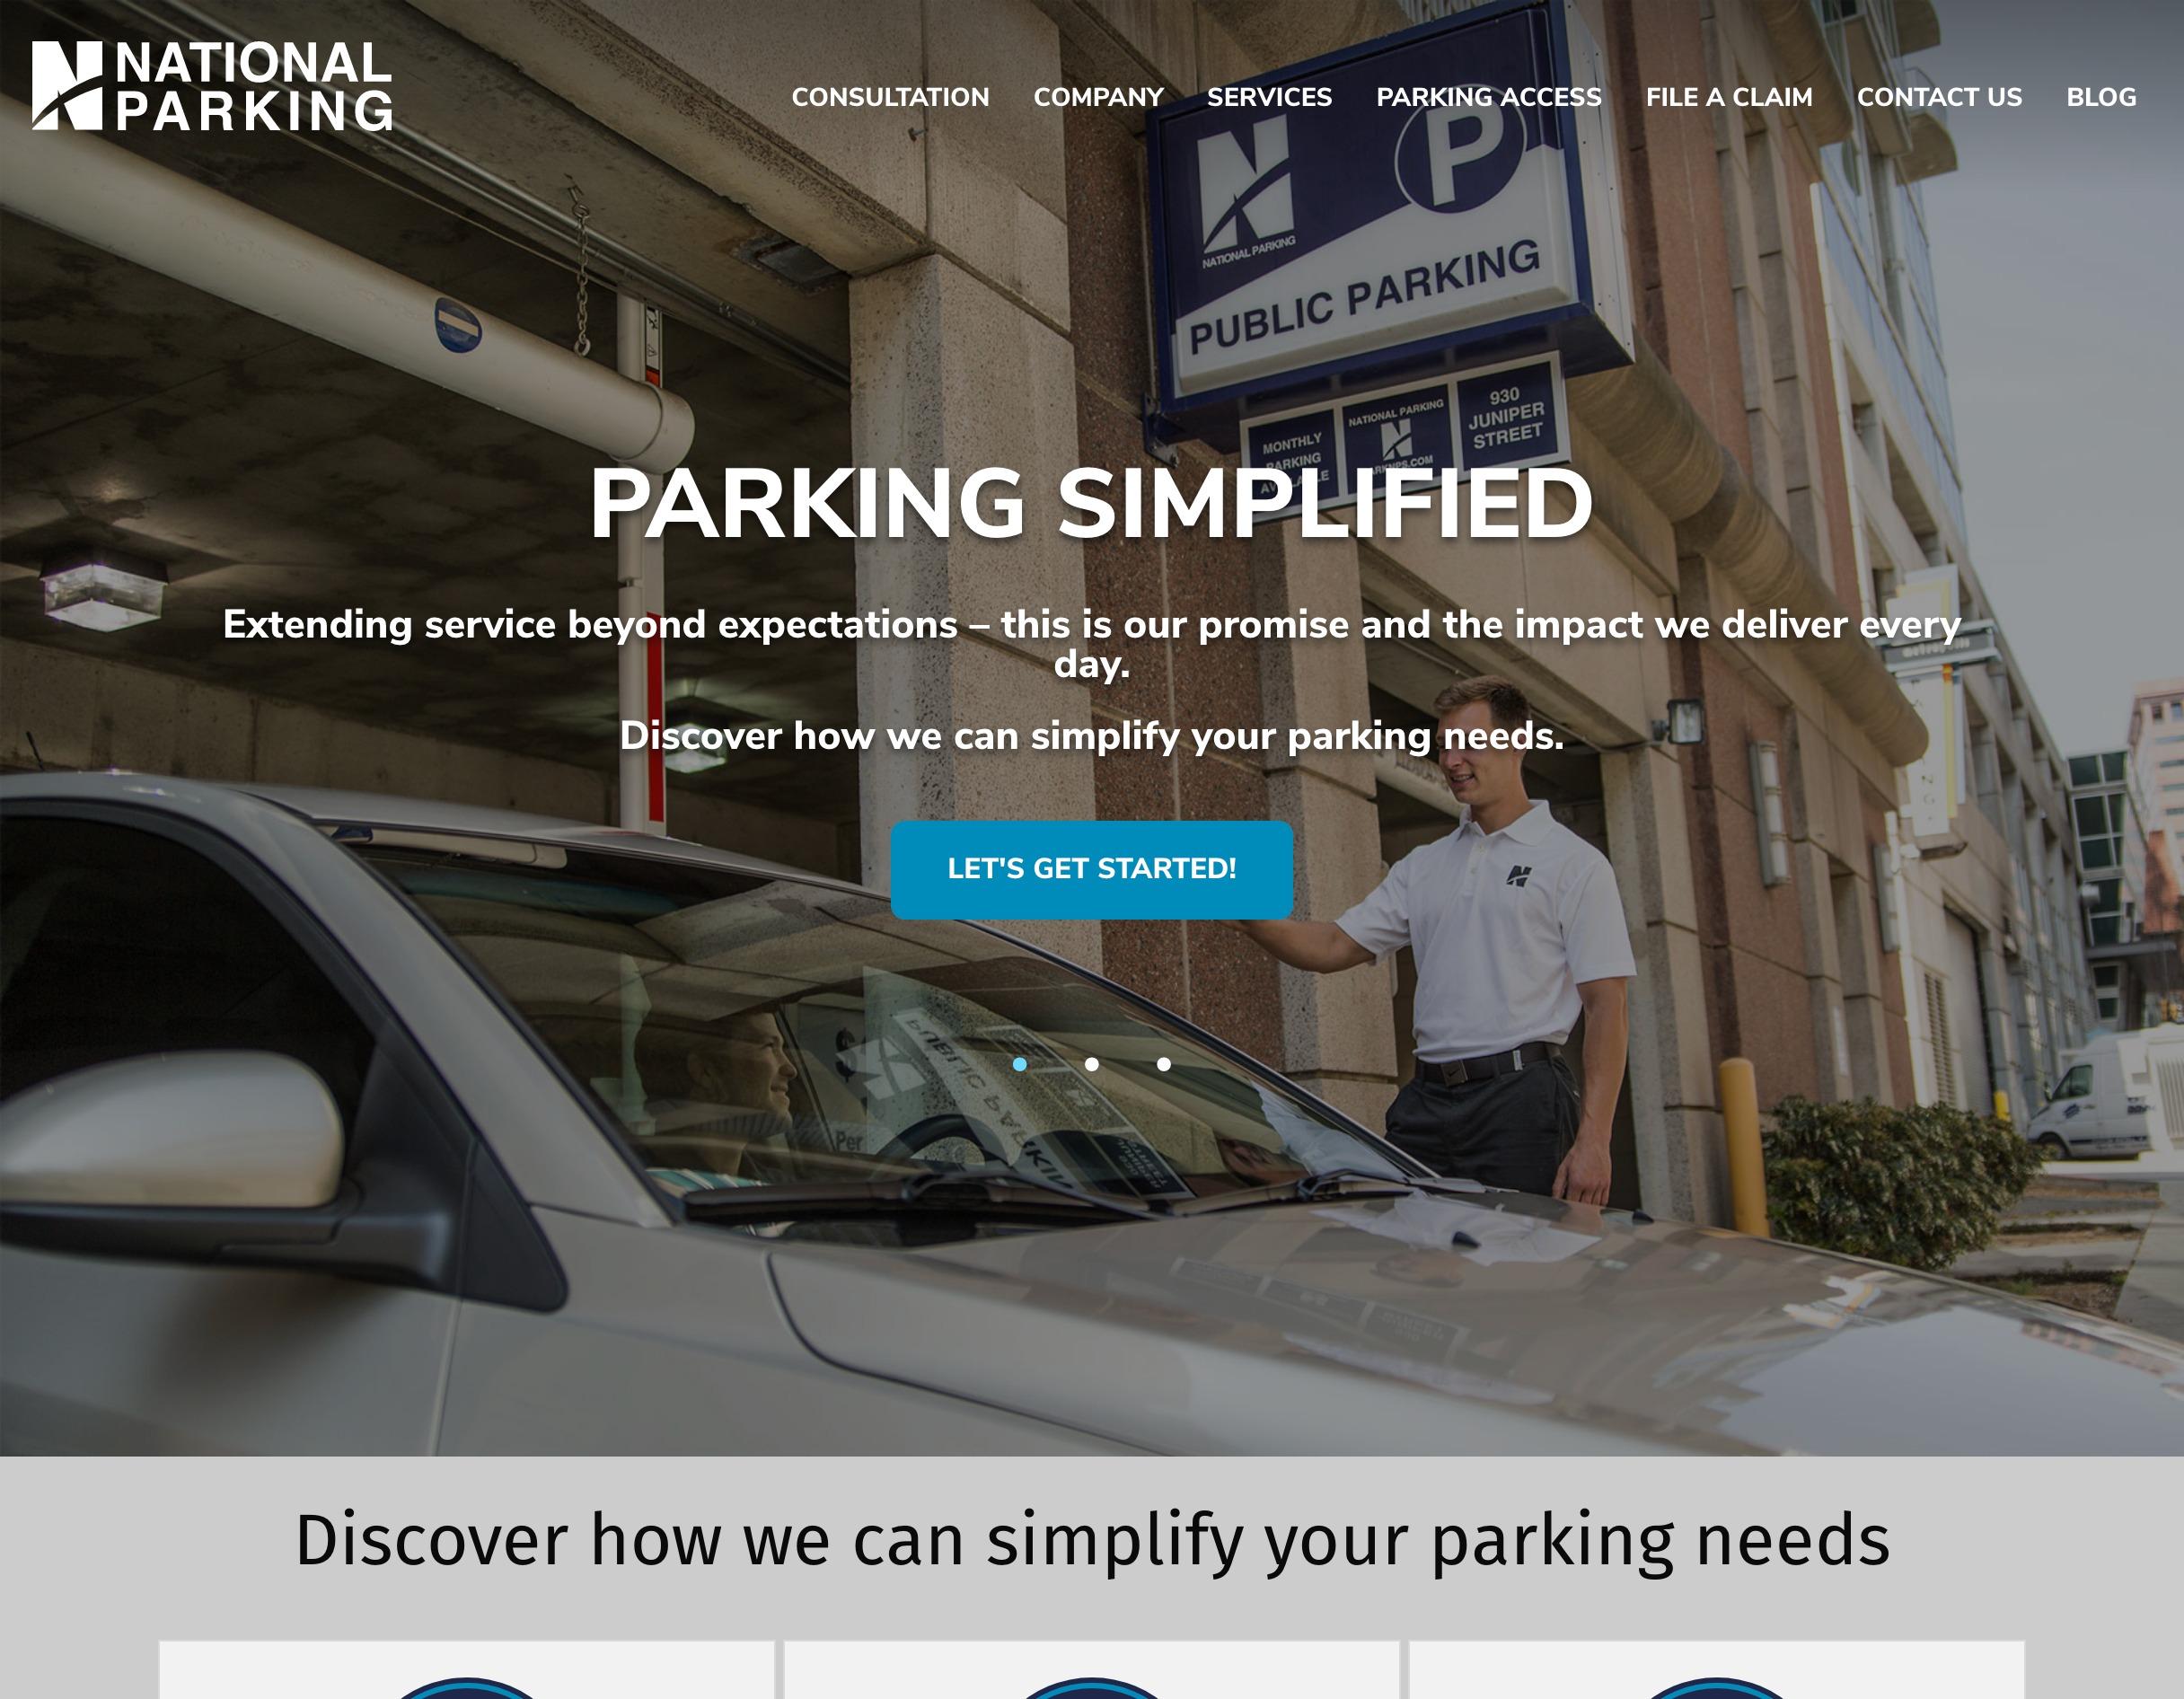 national-parking-atlanta-desktop-web-design-1